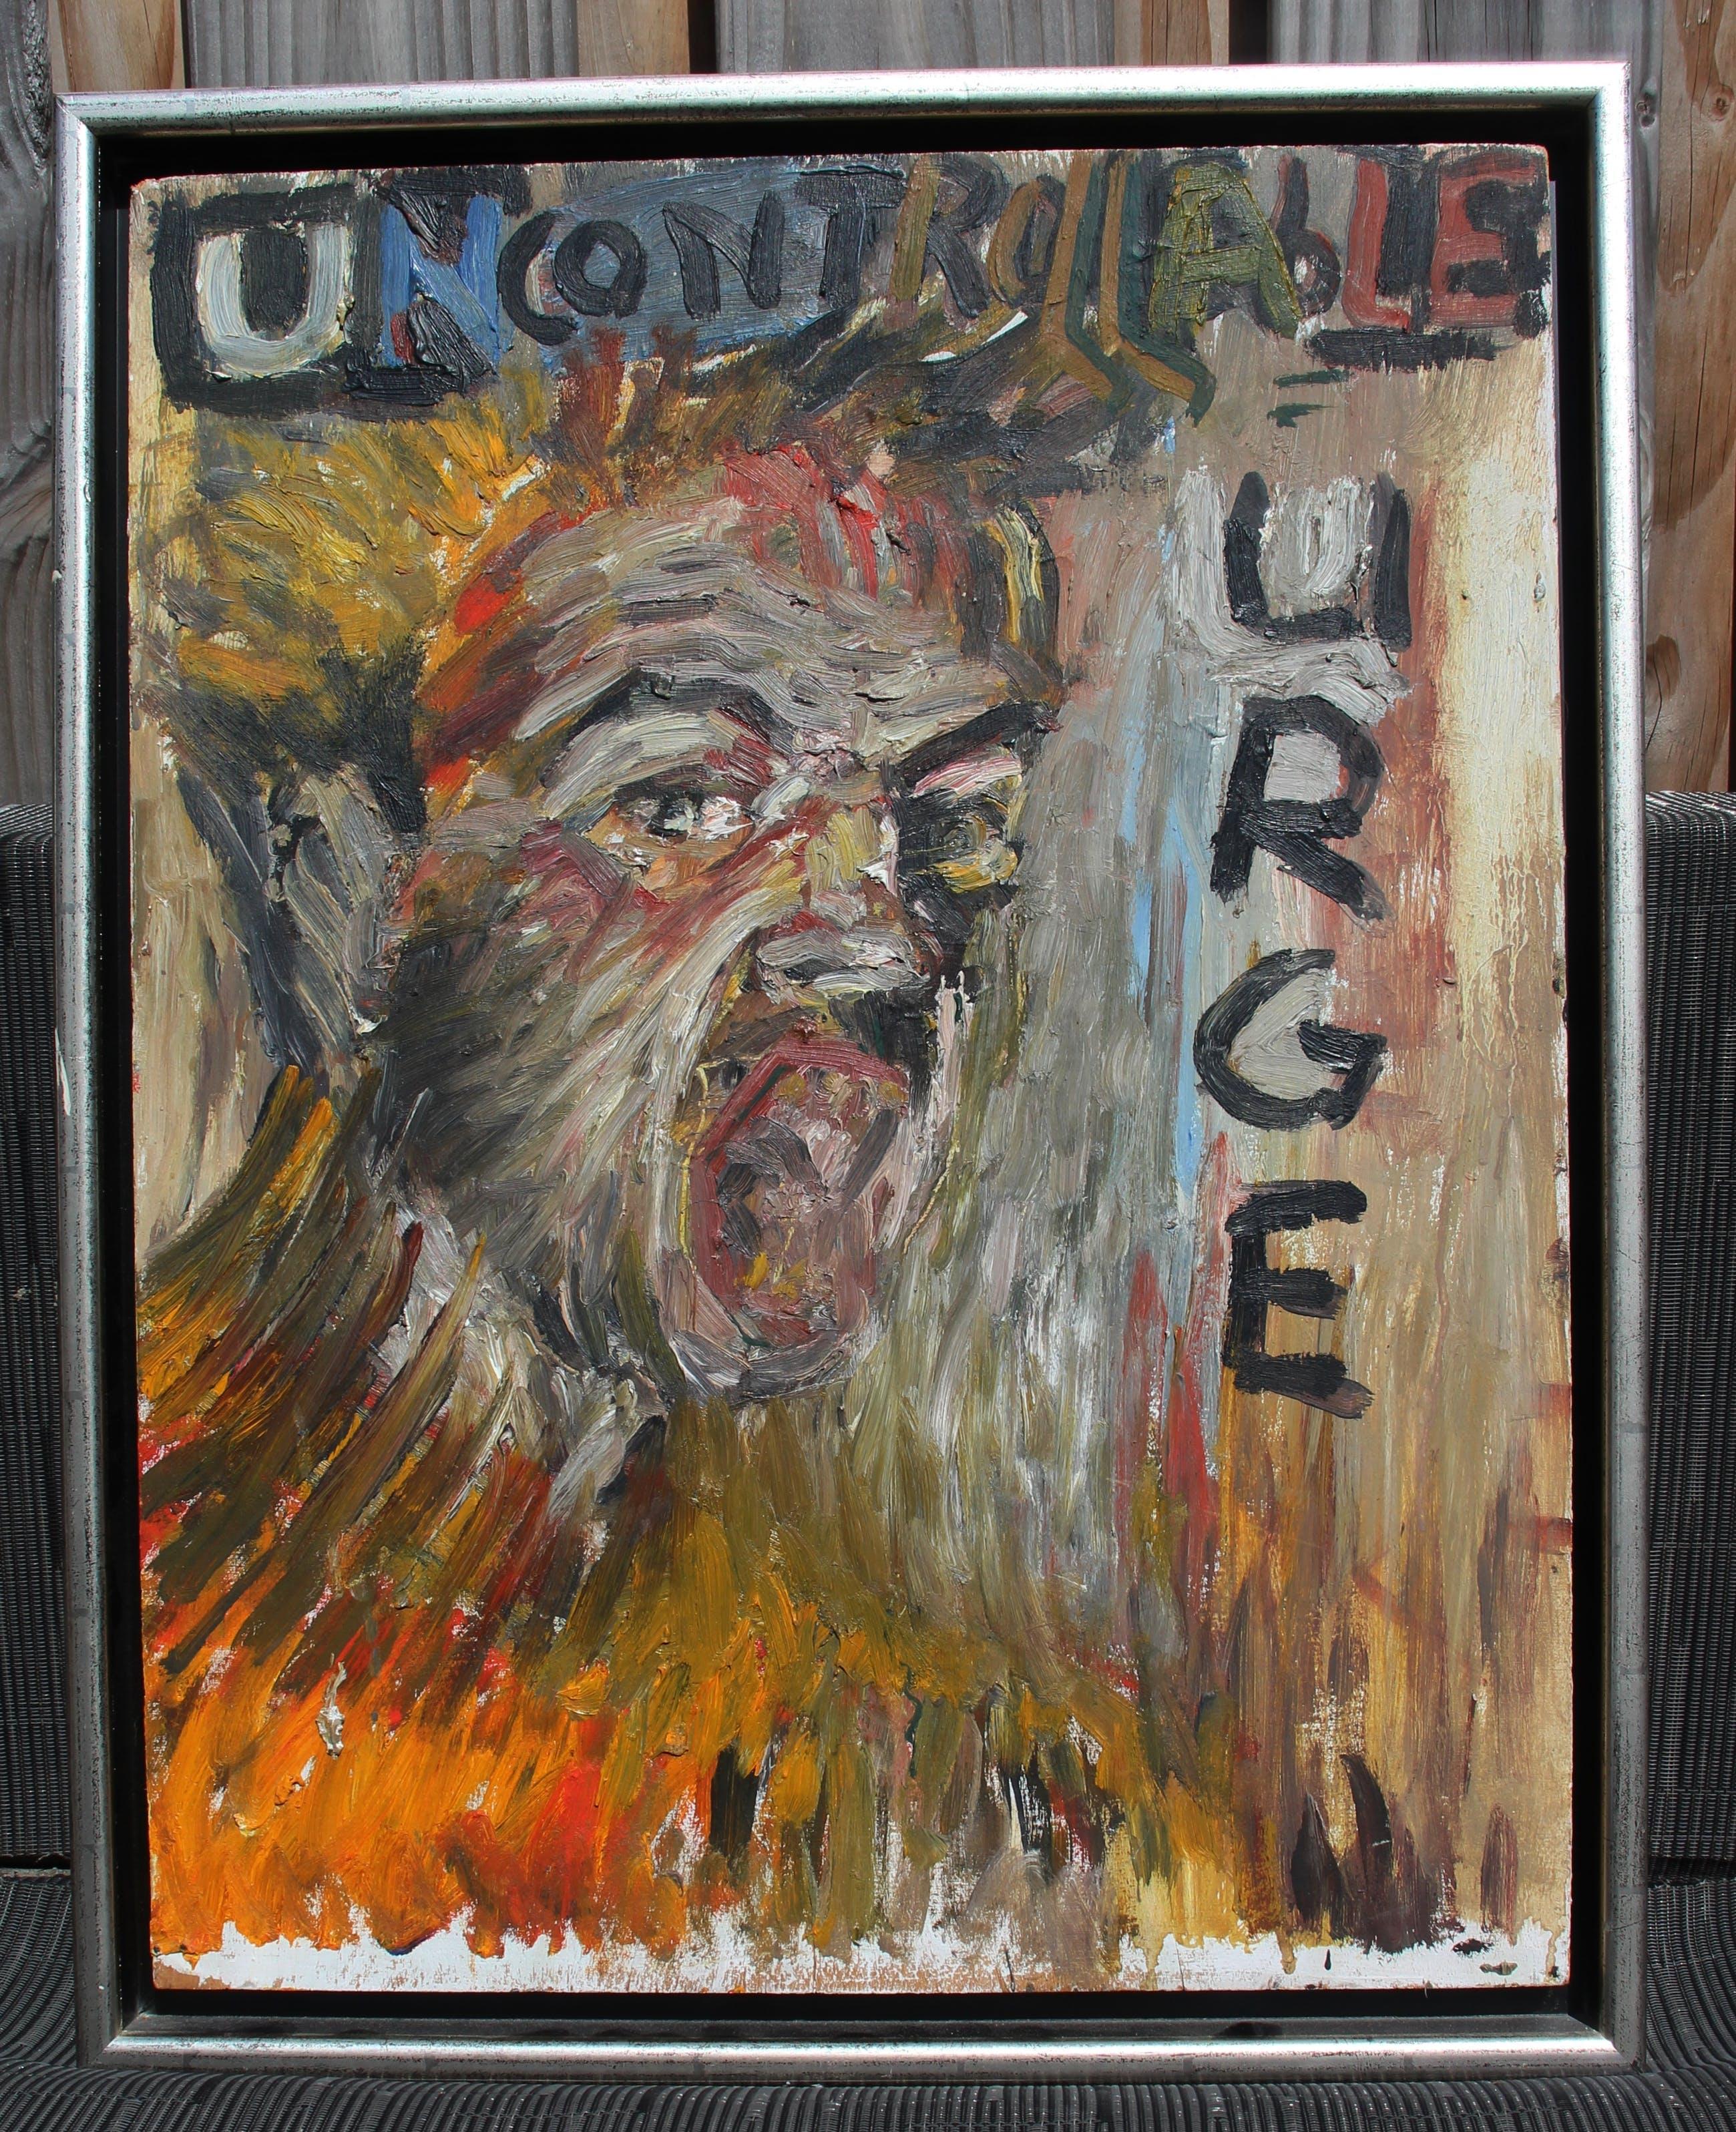 Peter Klashorst - acryl op board: zelfportret (uncontrollable urge) - 2004 kopen? Bied vanaf 199!